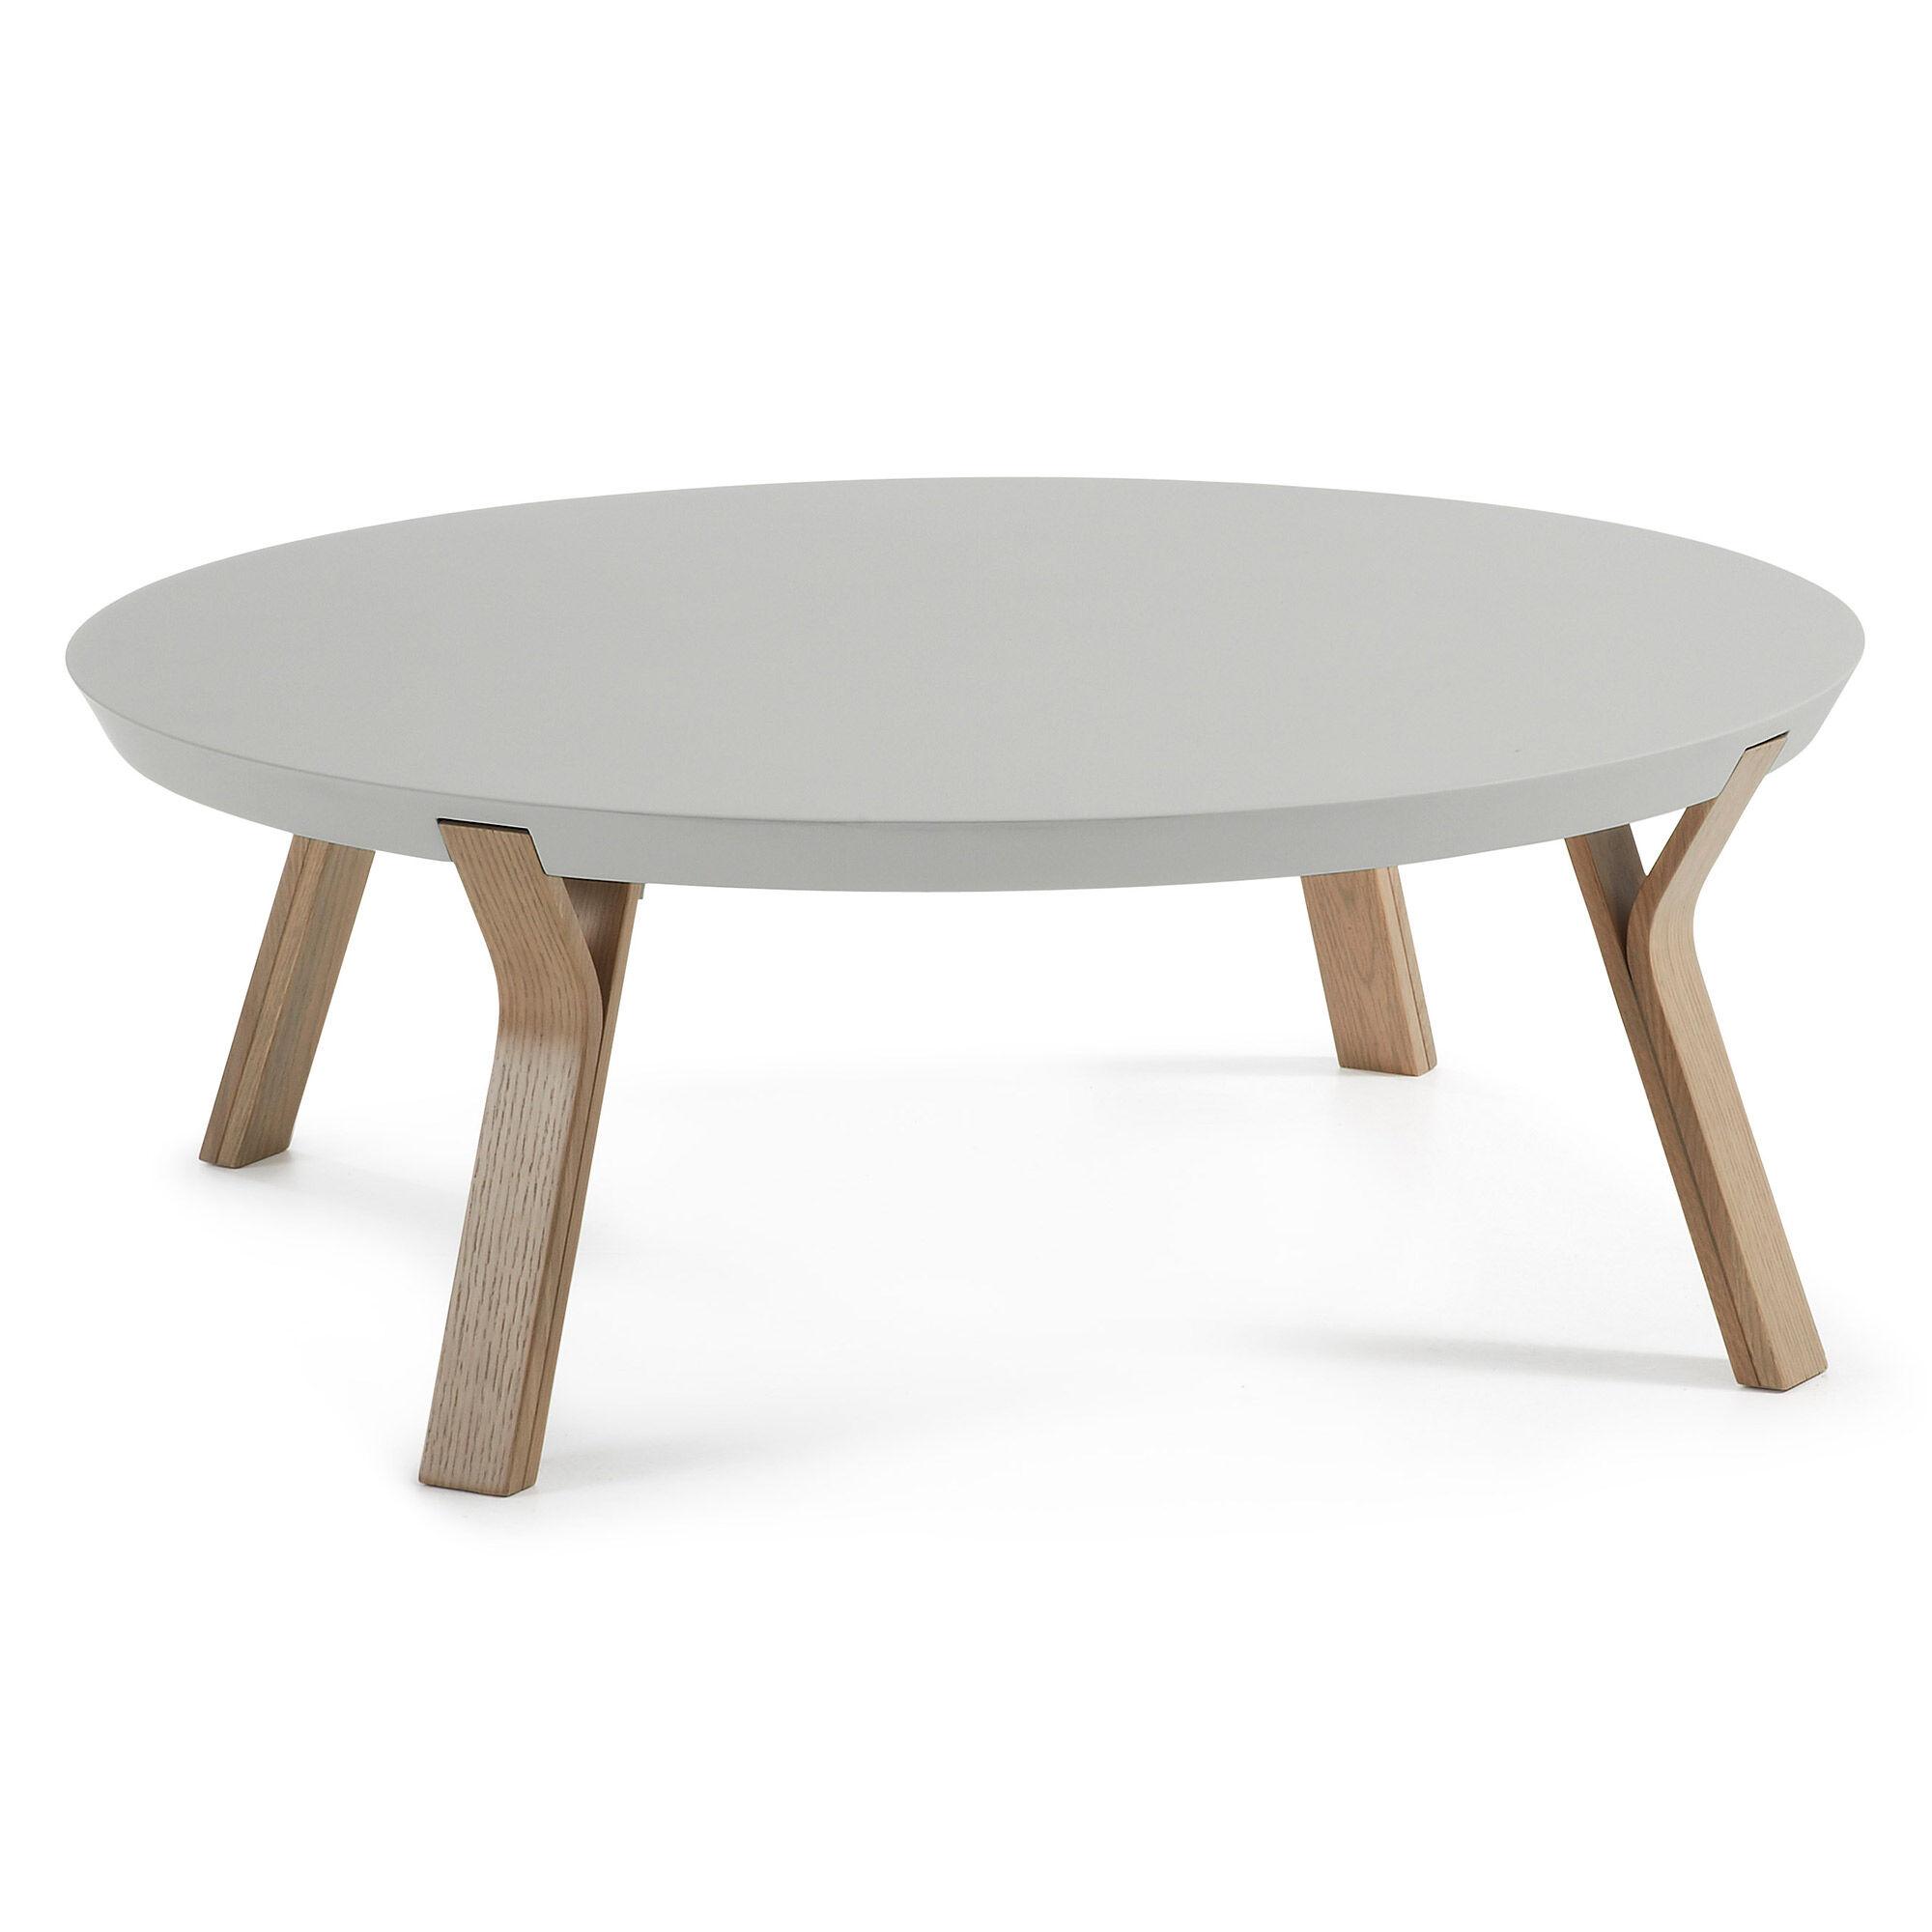 Kave Home Tavolino Dilos grigio e rovere Ø 90 cm